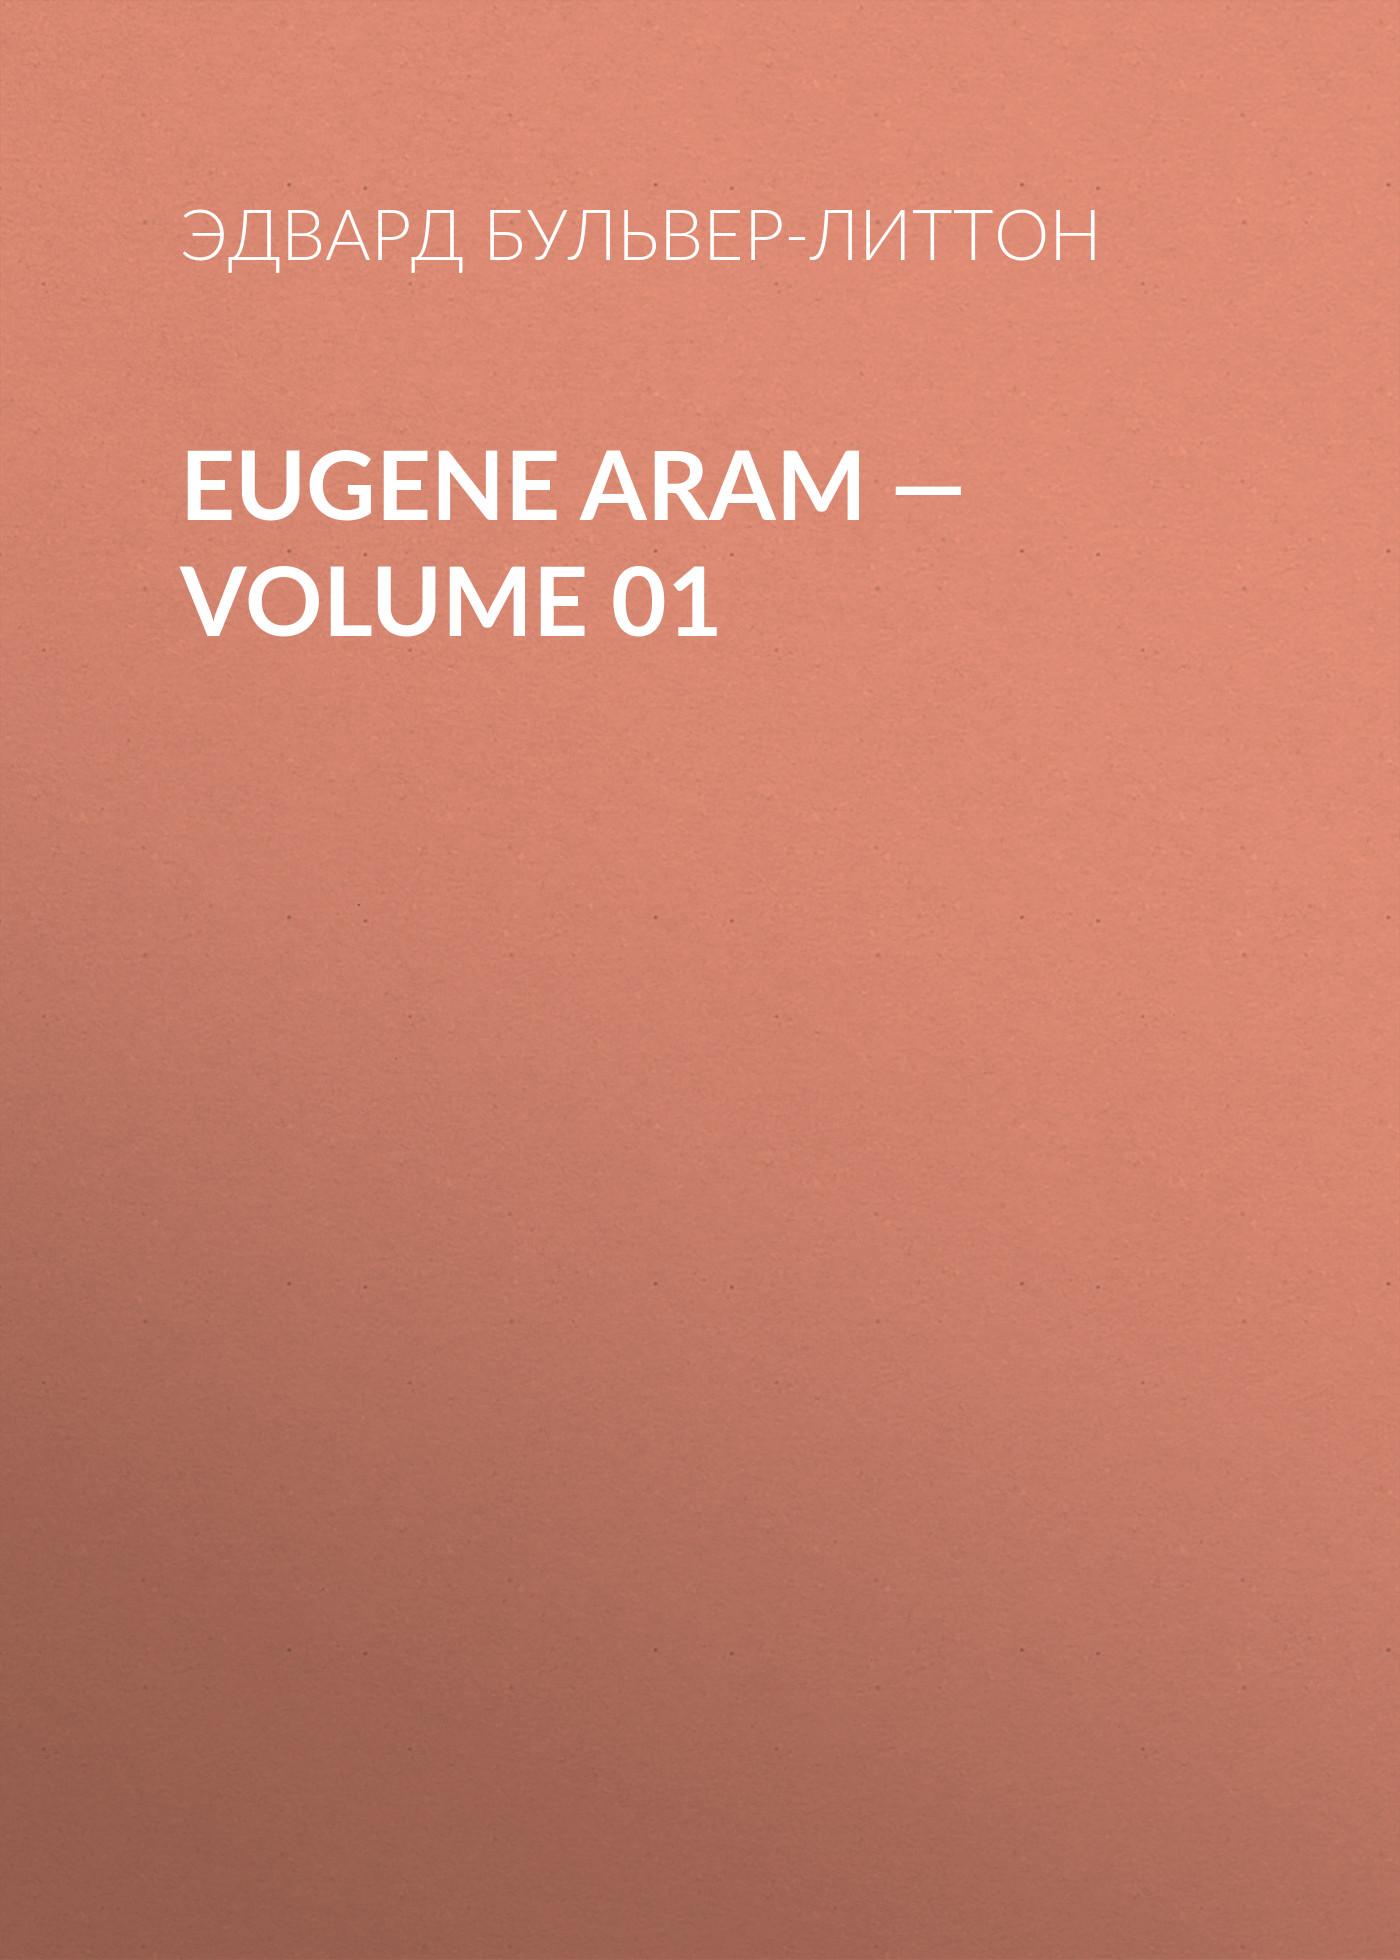 Эдвард Бульвер-Литтон Eugene Aram — Volume 01 c e kollman les sept peches capitaux par eugene sue cinquem volume